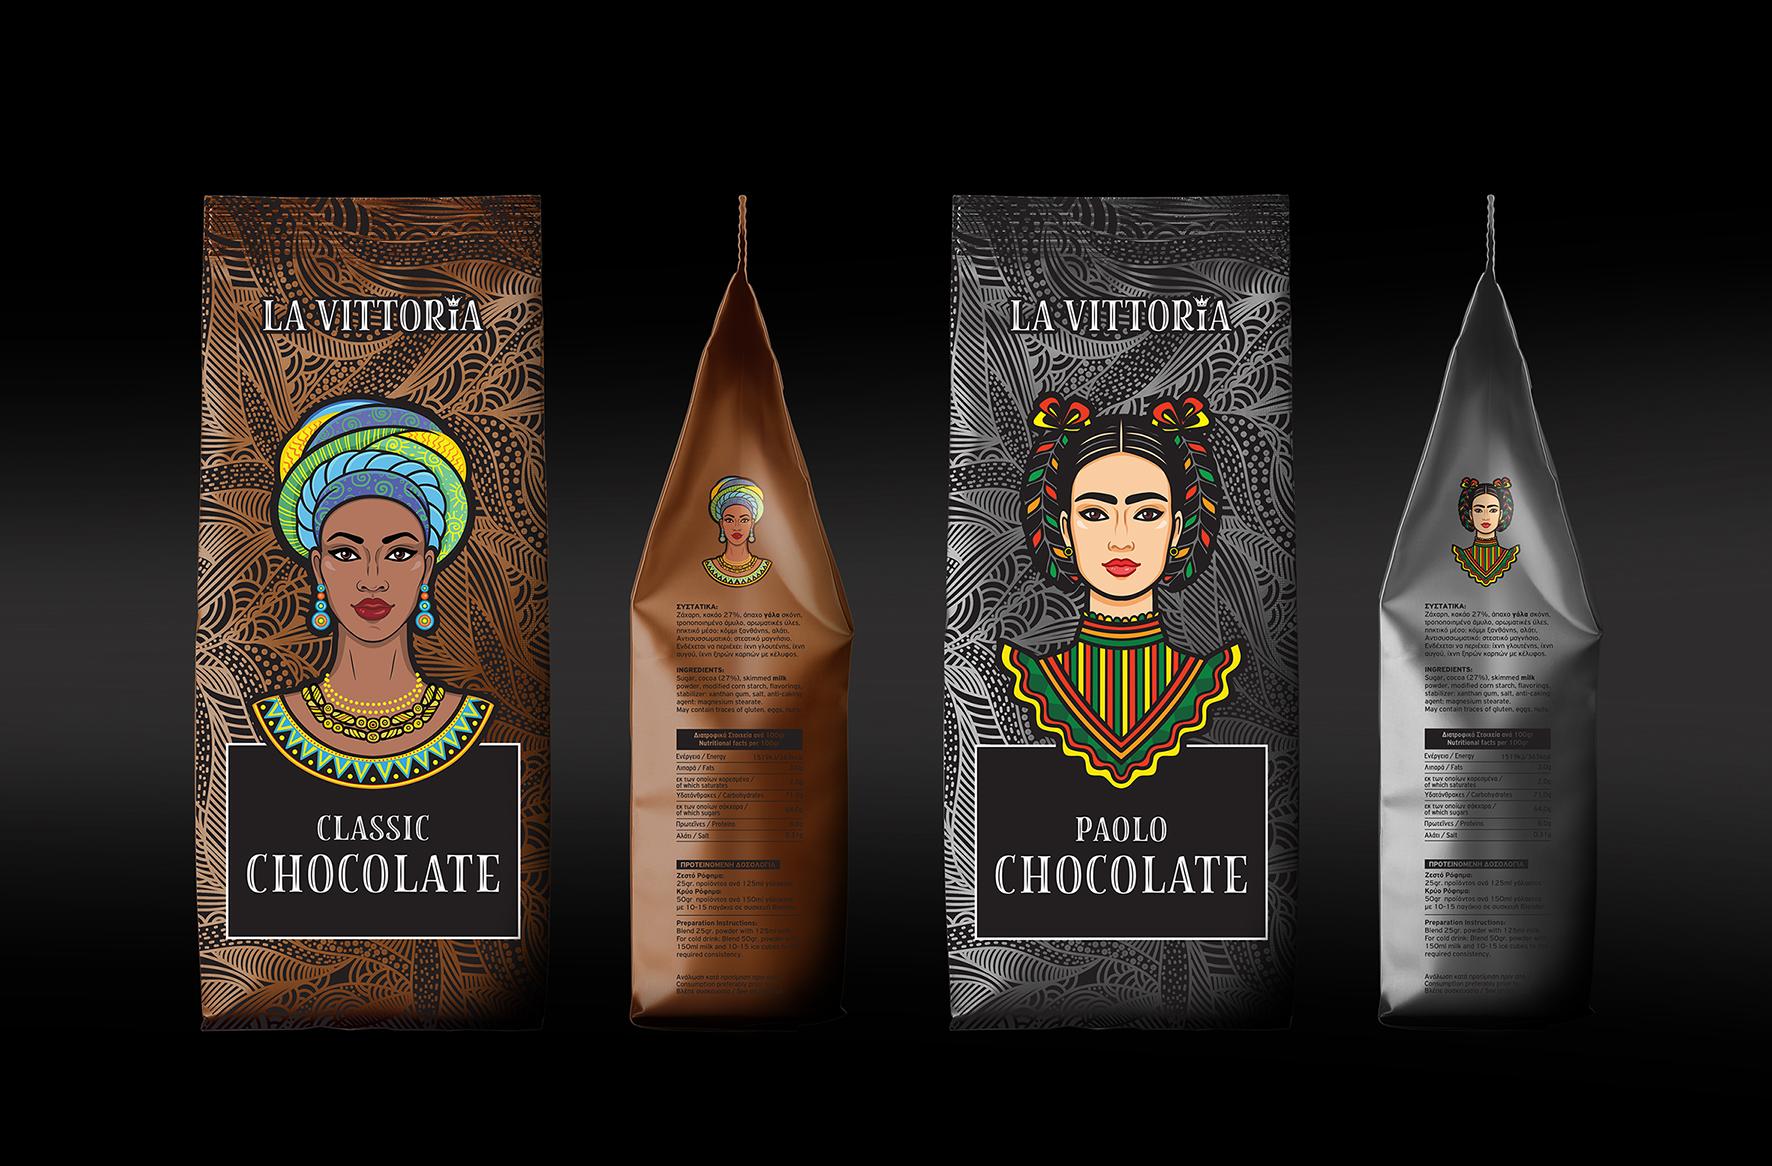 La Vittoria Chocolate